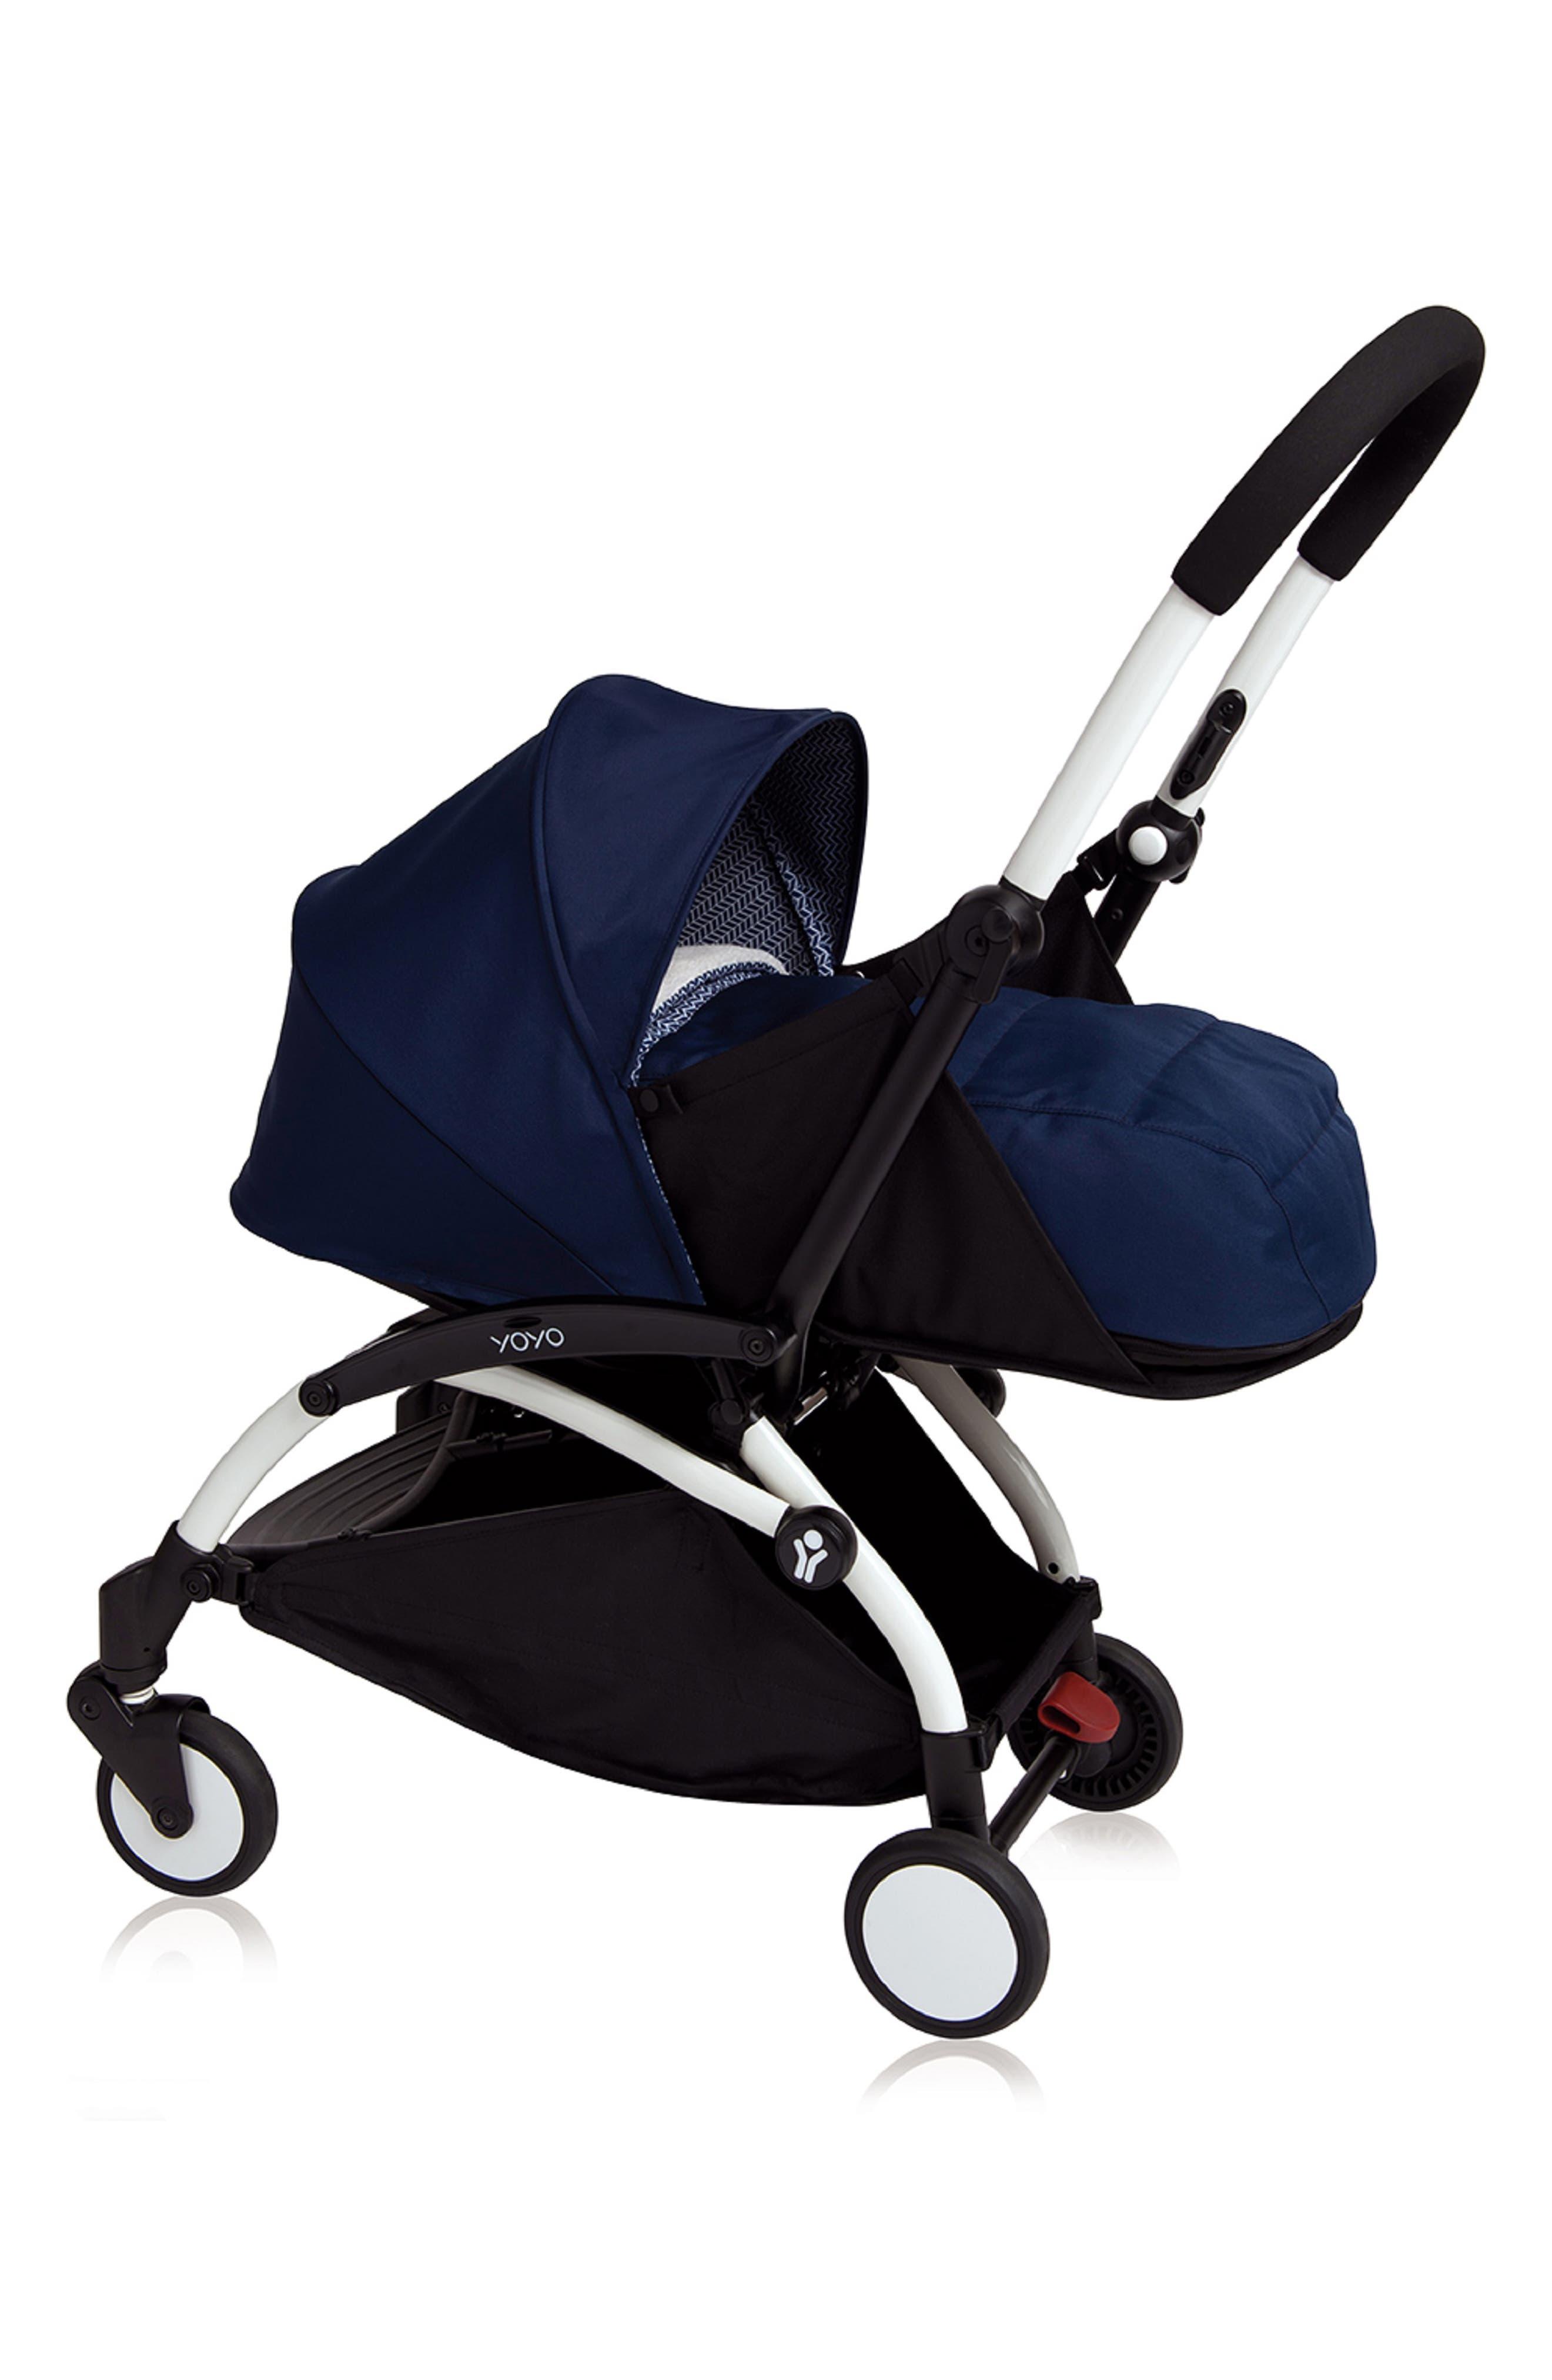 YOYO+ Newborn Stroller Frame,                             Main thumbnail 1, color,                             WHITE/ AIR FRANCE NAVY